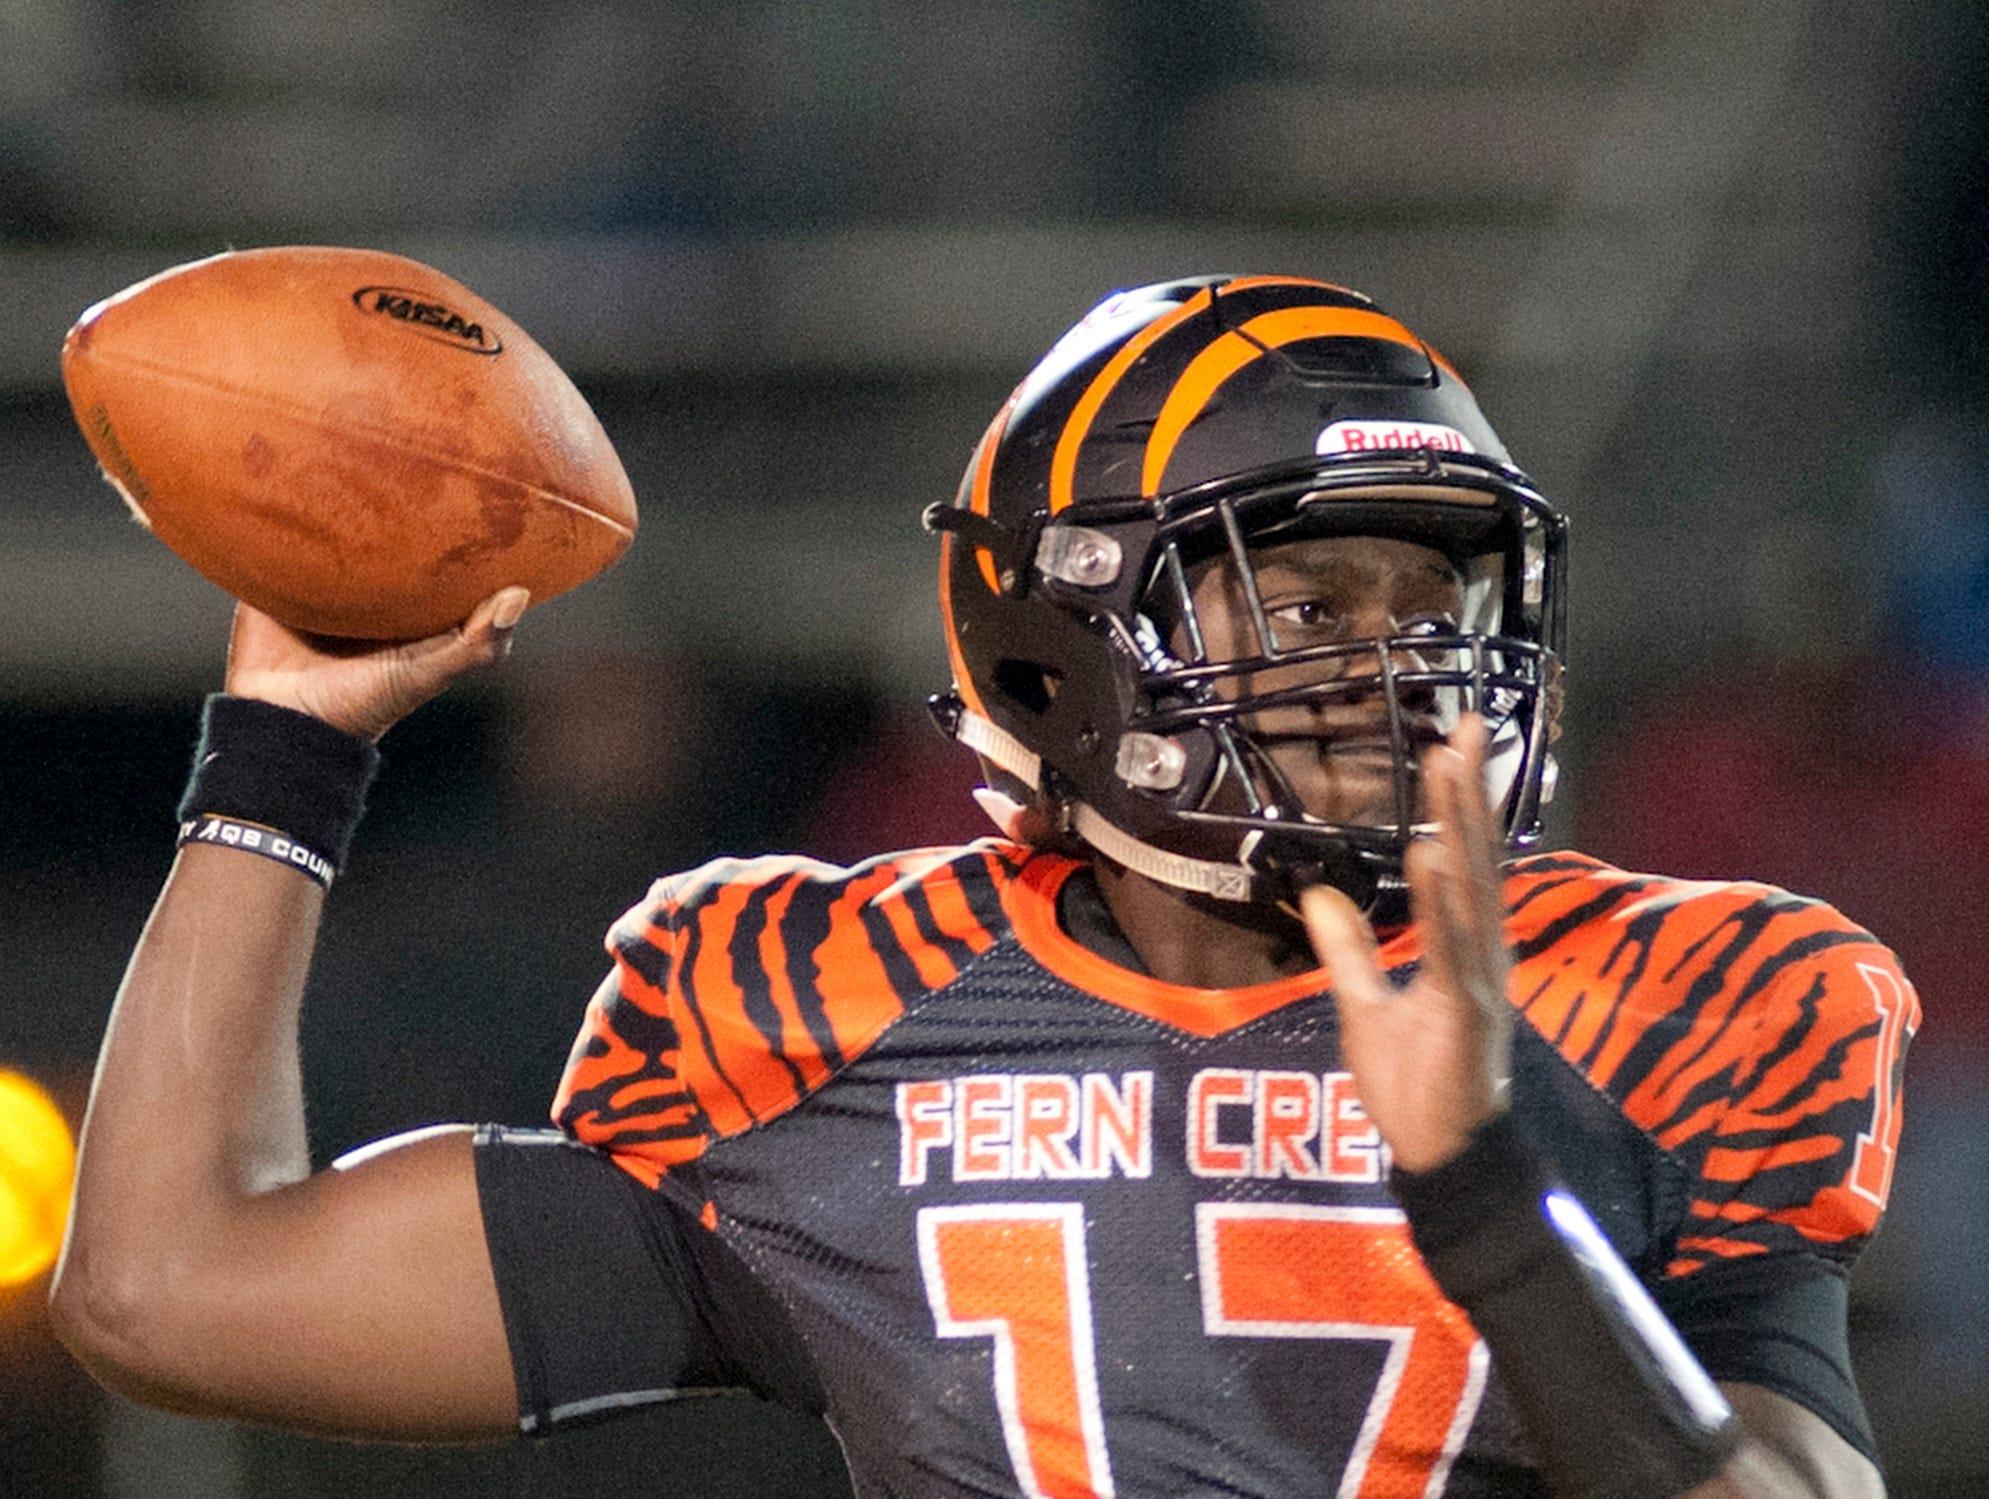 Fern Creek quarterback Isaiah Hester prepares to throw. Nov. 9, 2018